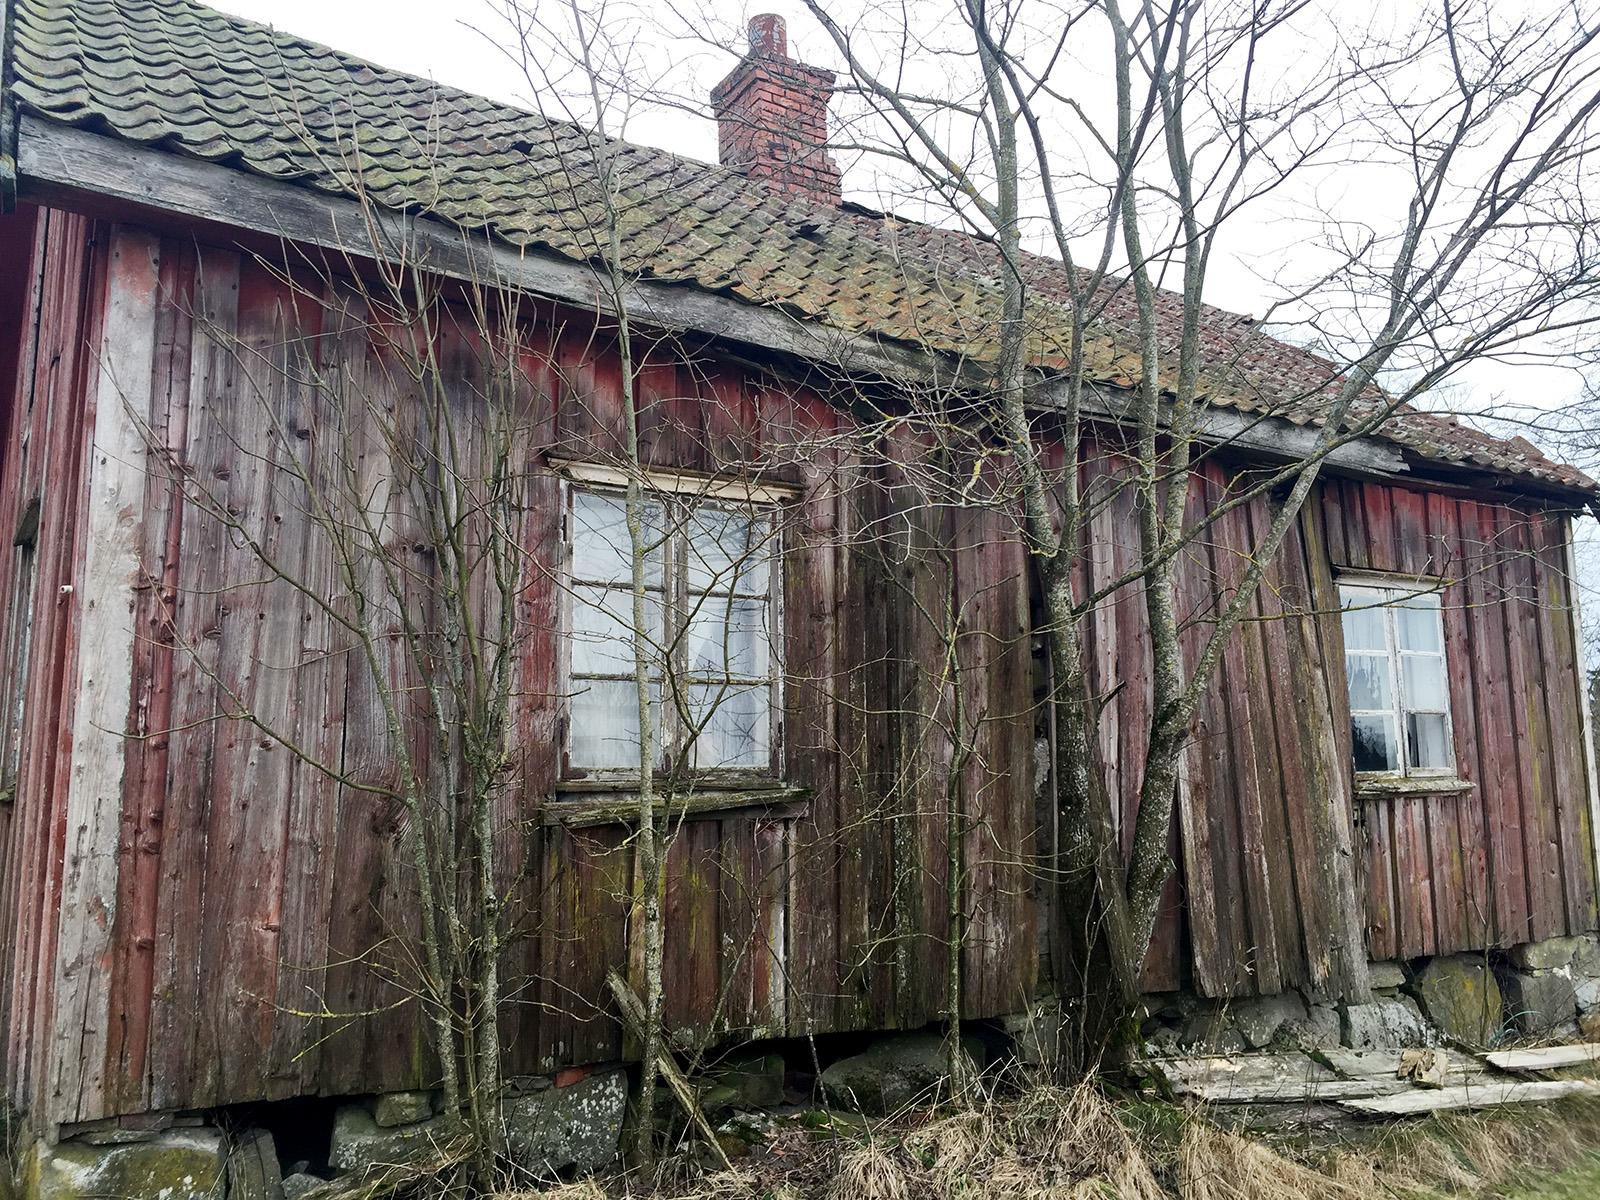 Forfallent hus på Fagerås i Trøgstad, Østfold. Reddes nå med midler fra Kulturminnefondet. Foto: Kulturminnefondet/Linda Cathrine Herud